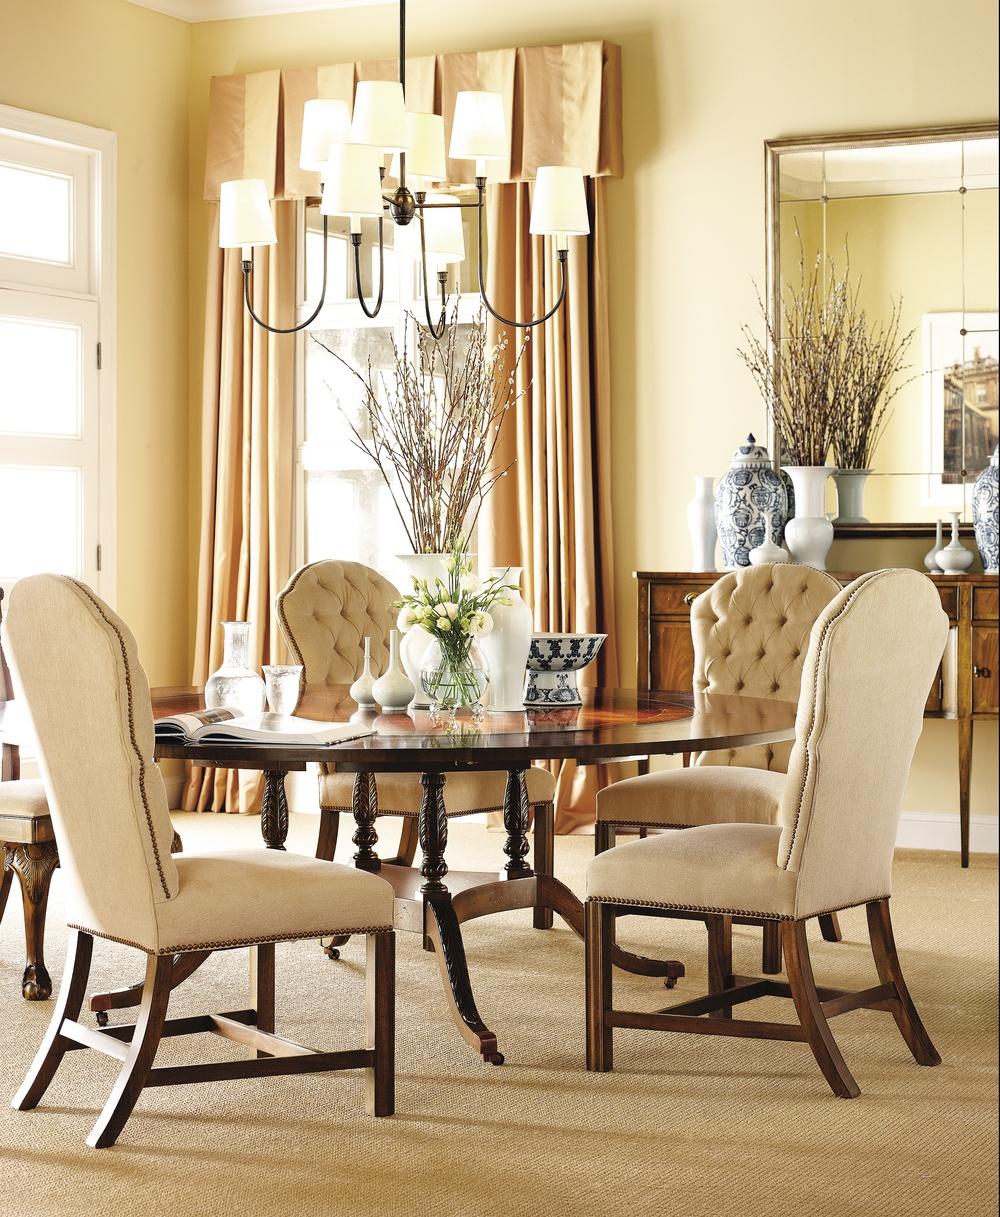 Hickory Chair - Marlboro Tufted Chair